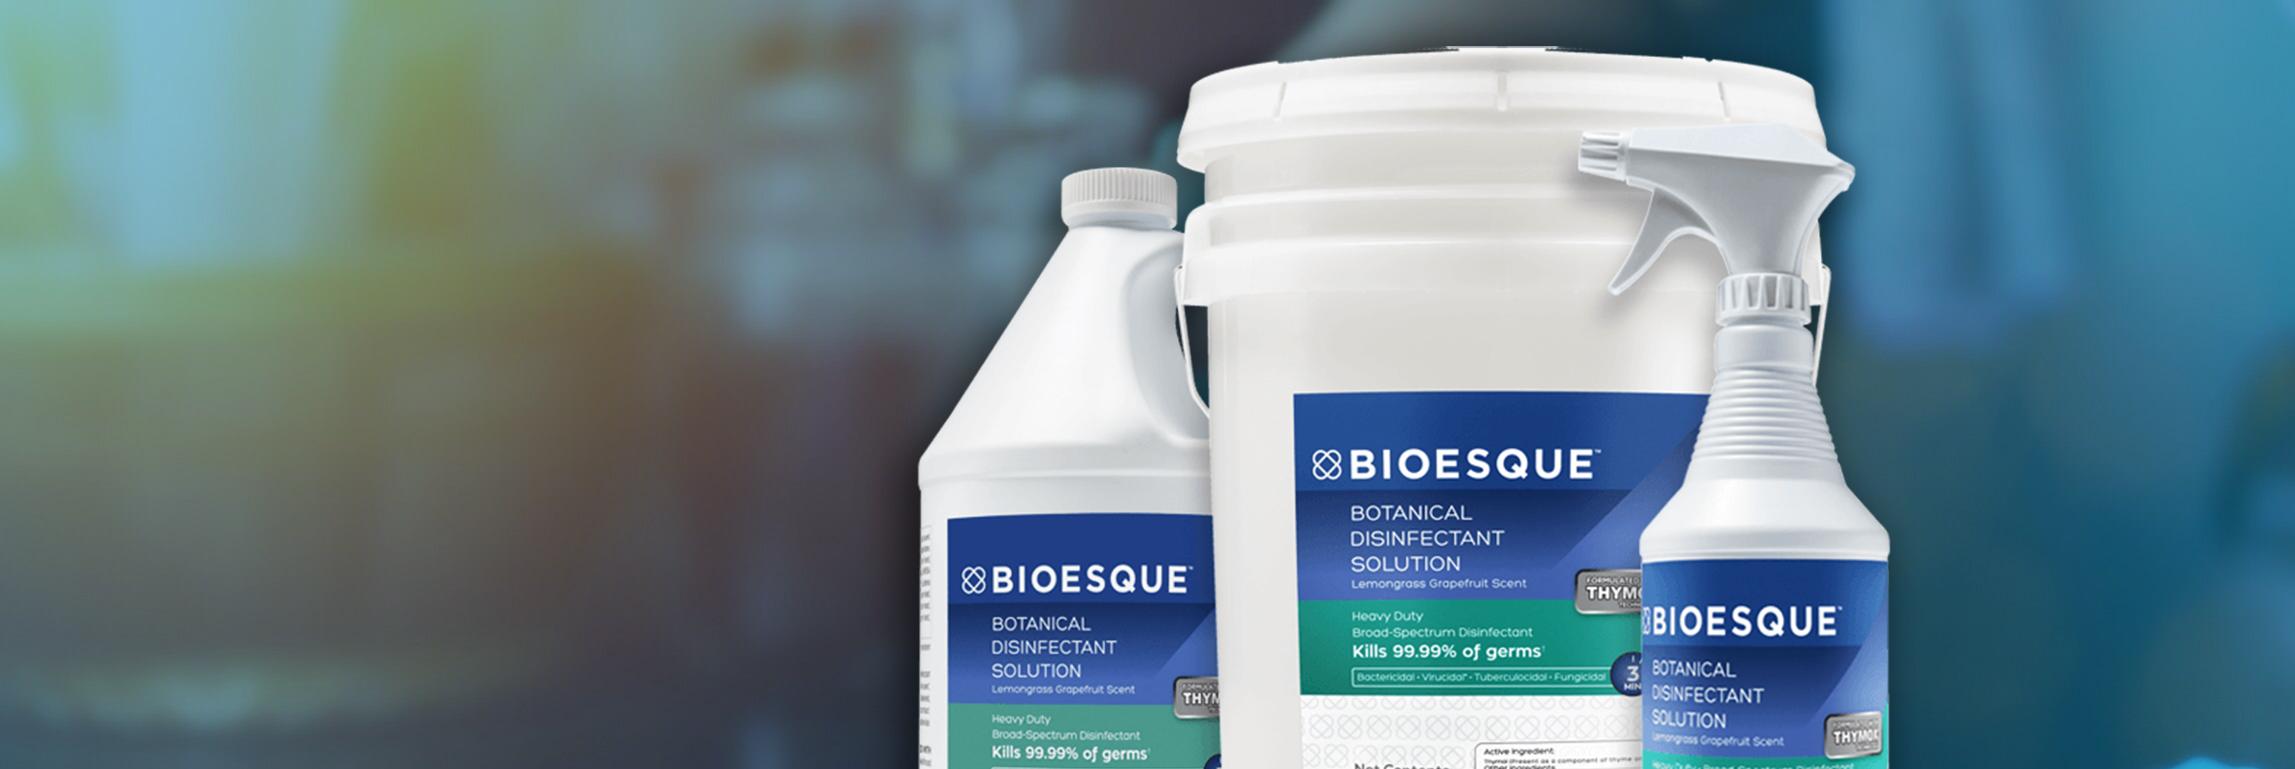 Bioesque Botanical Disinfectant Solution